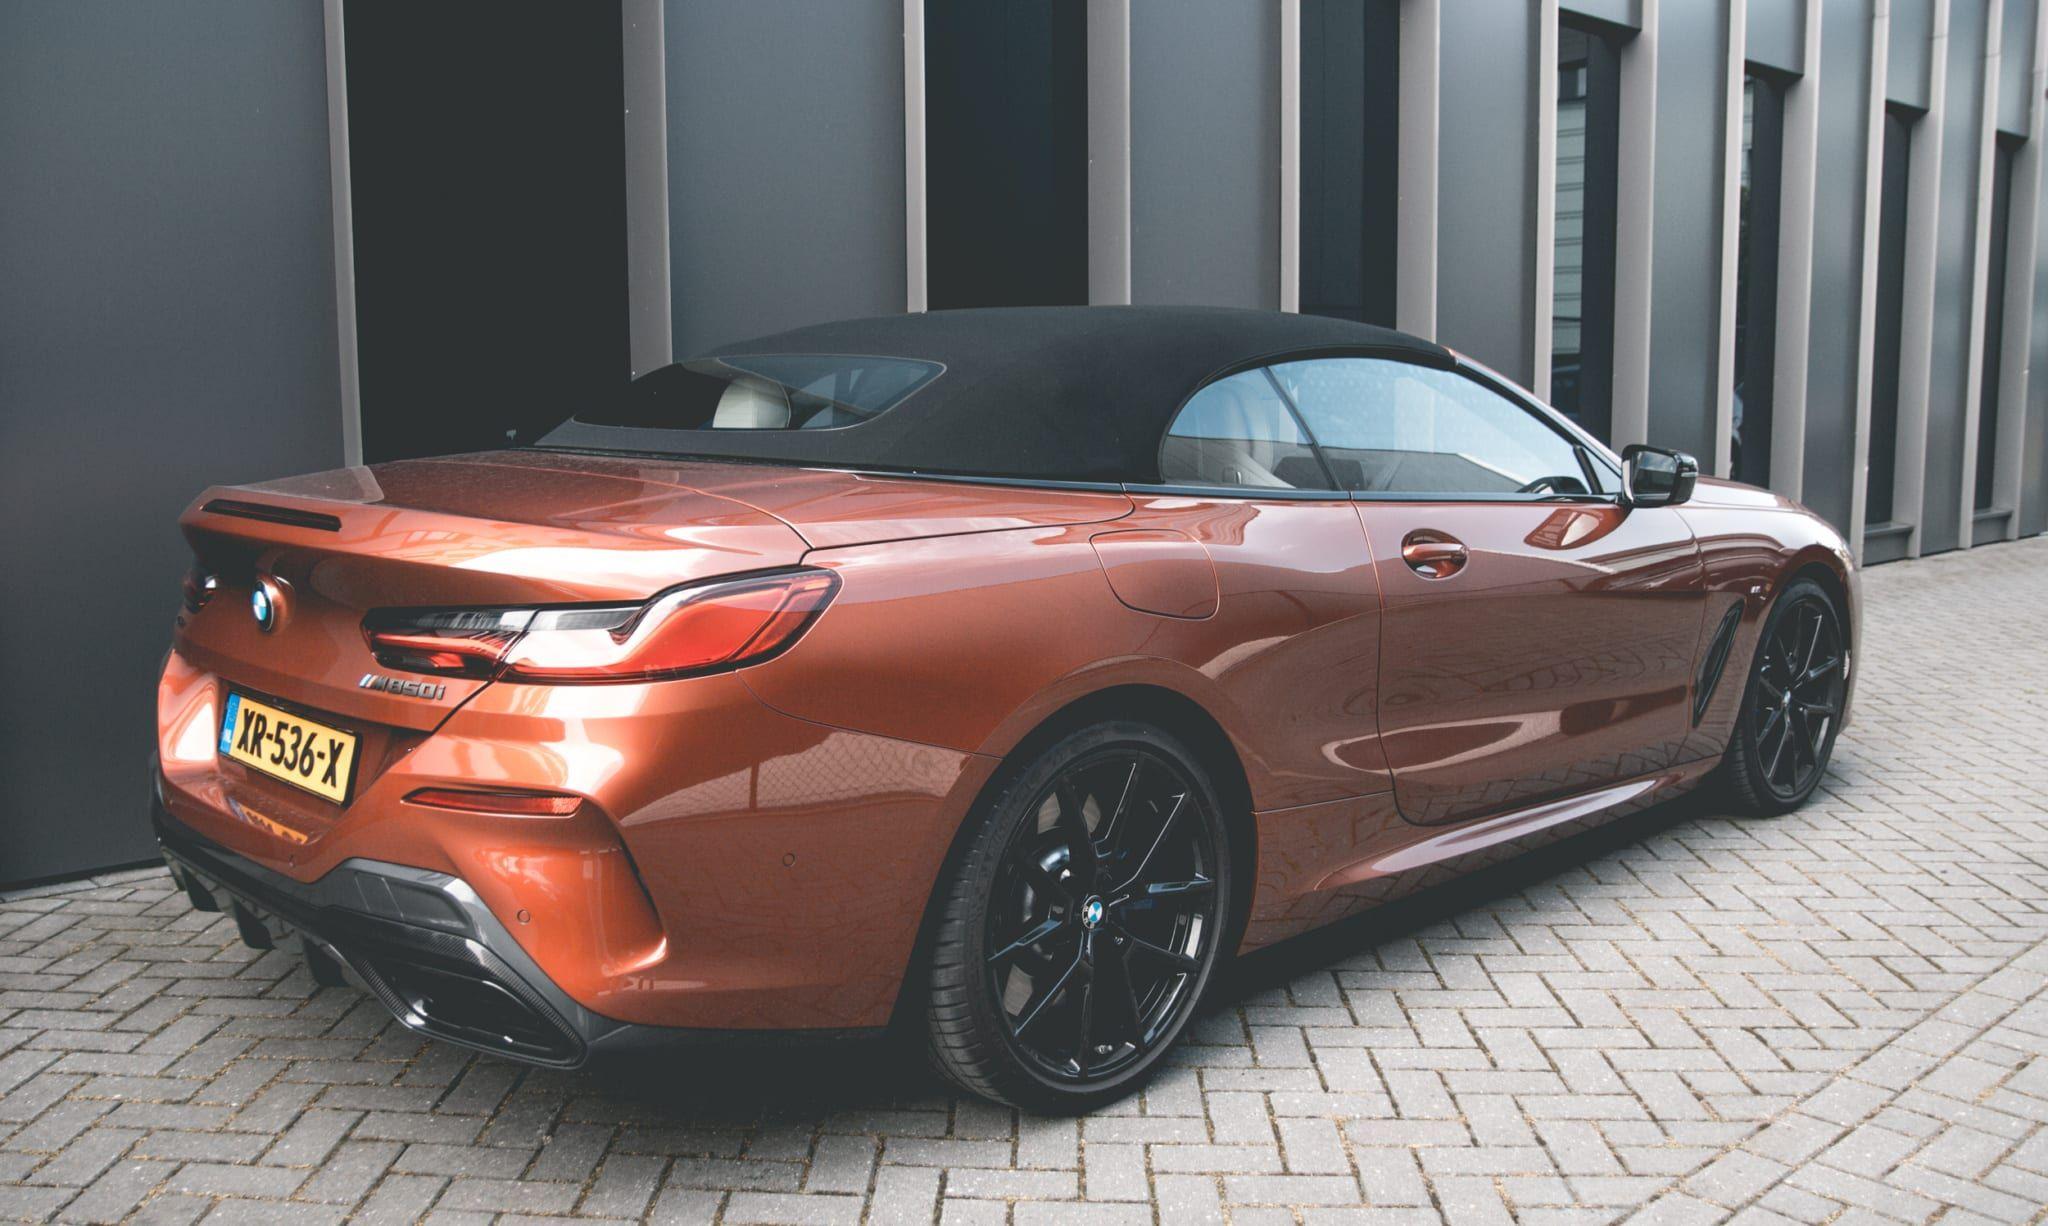 Bmw M850i Xdrive Cabrio Manify Nl In 2020 Bmw Zwarte Velgen Auto